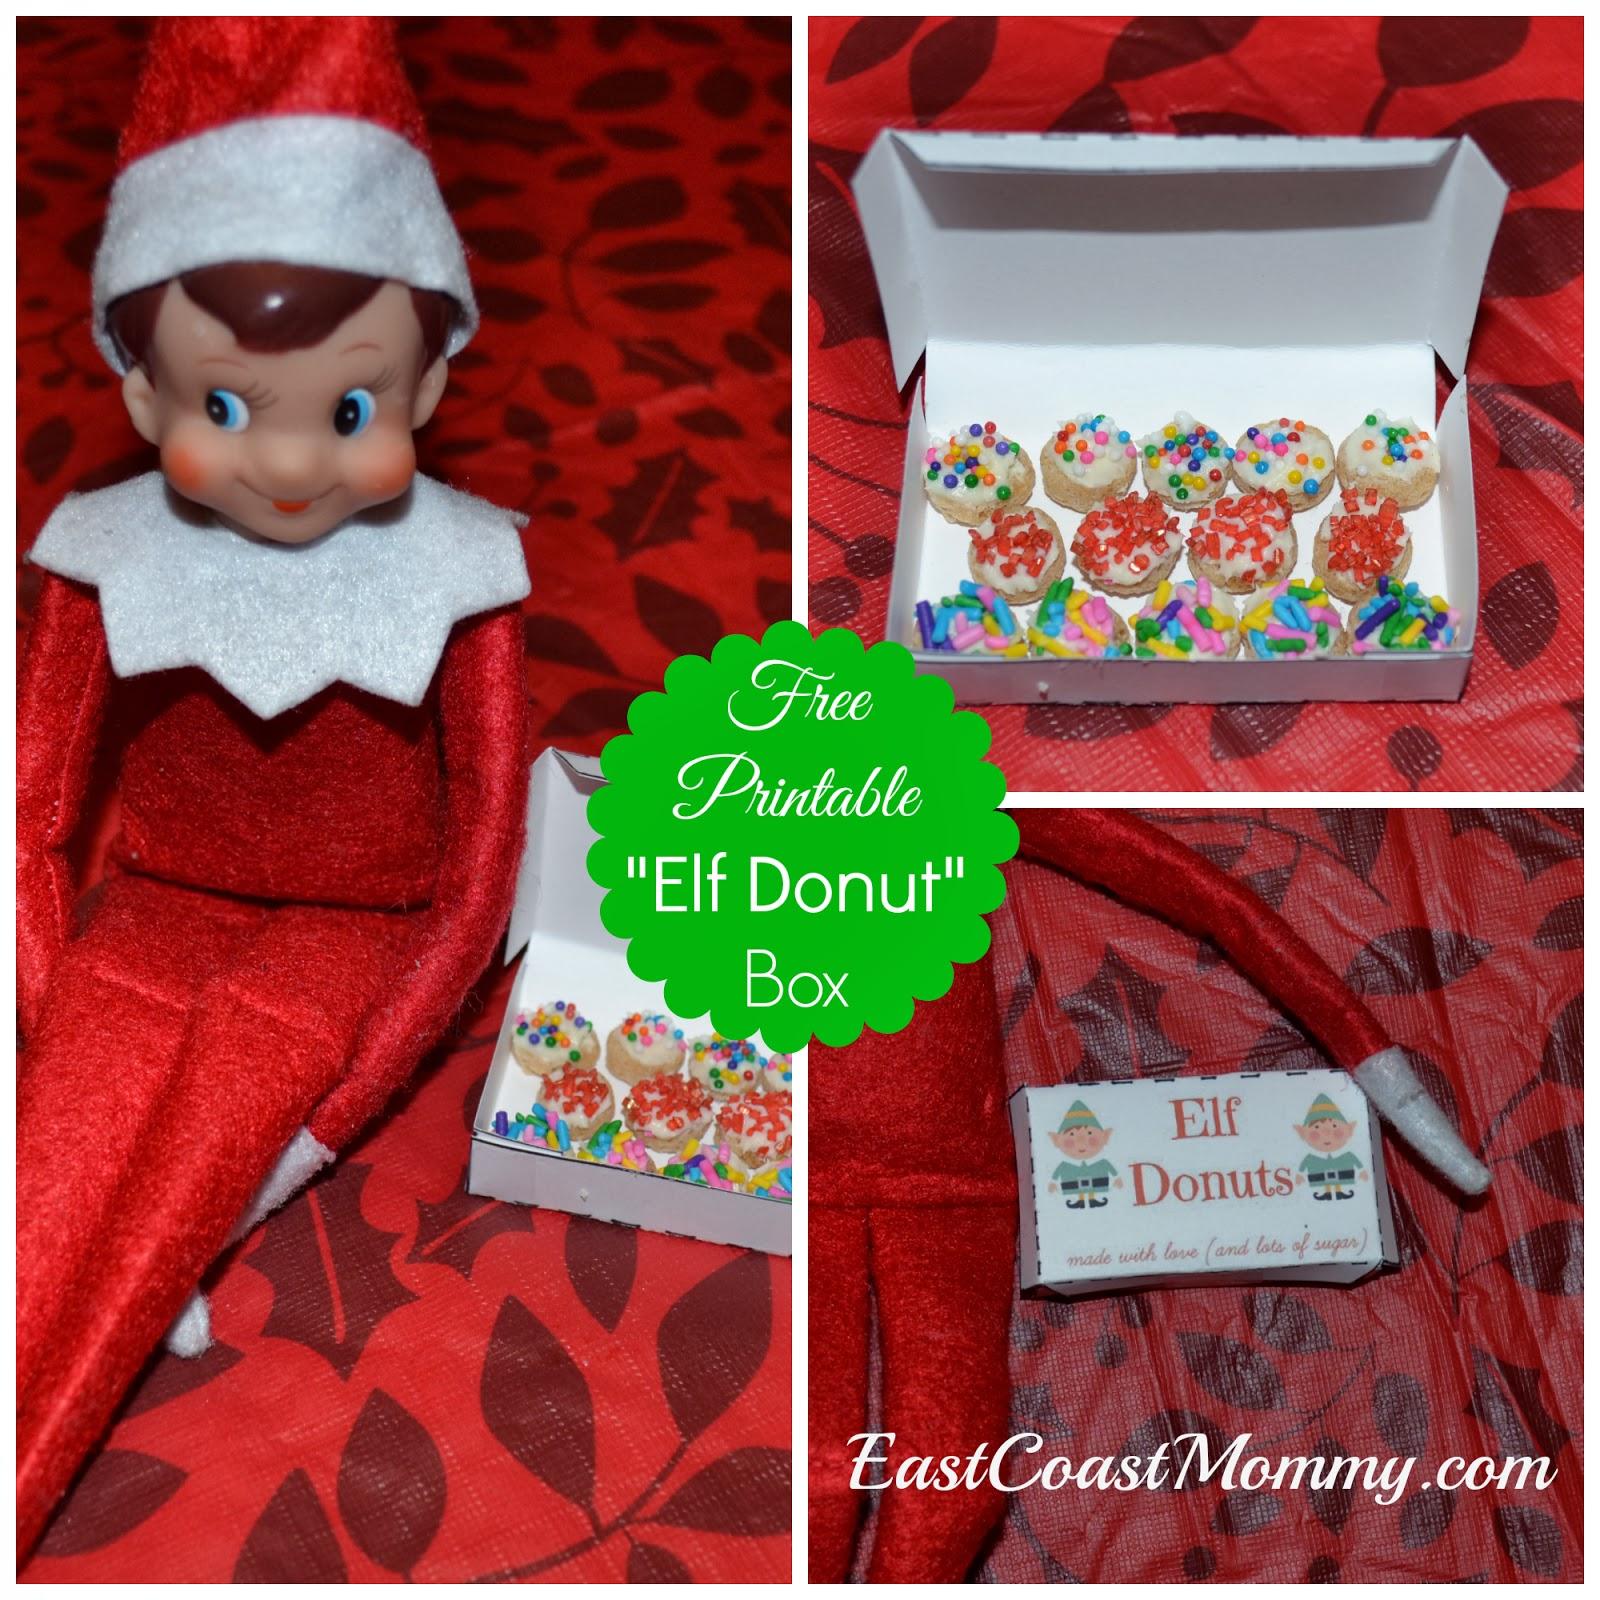 Elf on the Shelf Donuts…Free Printable Box